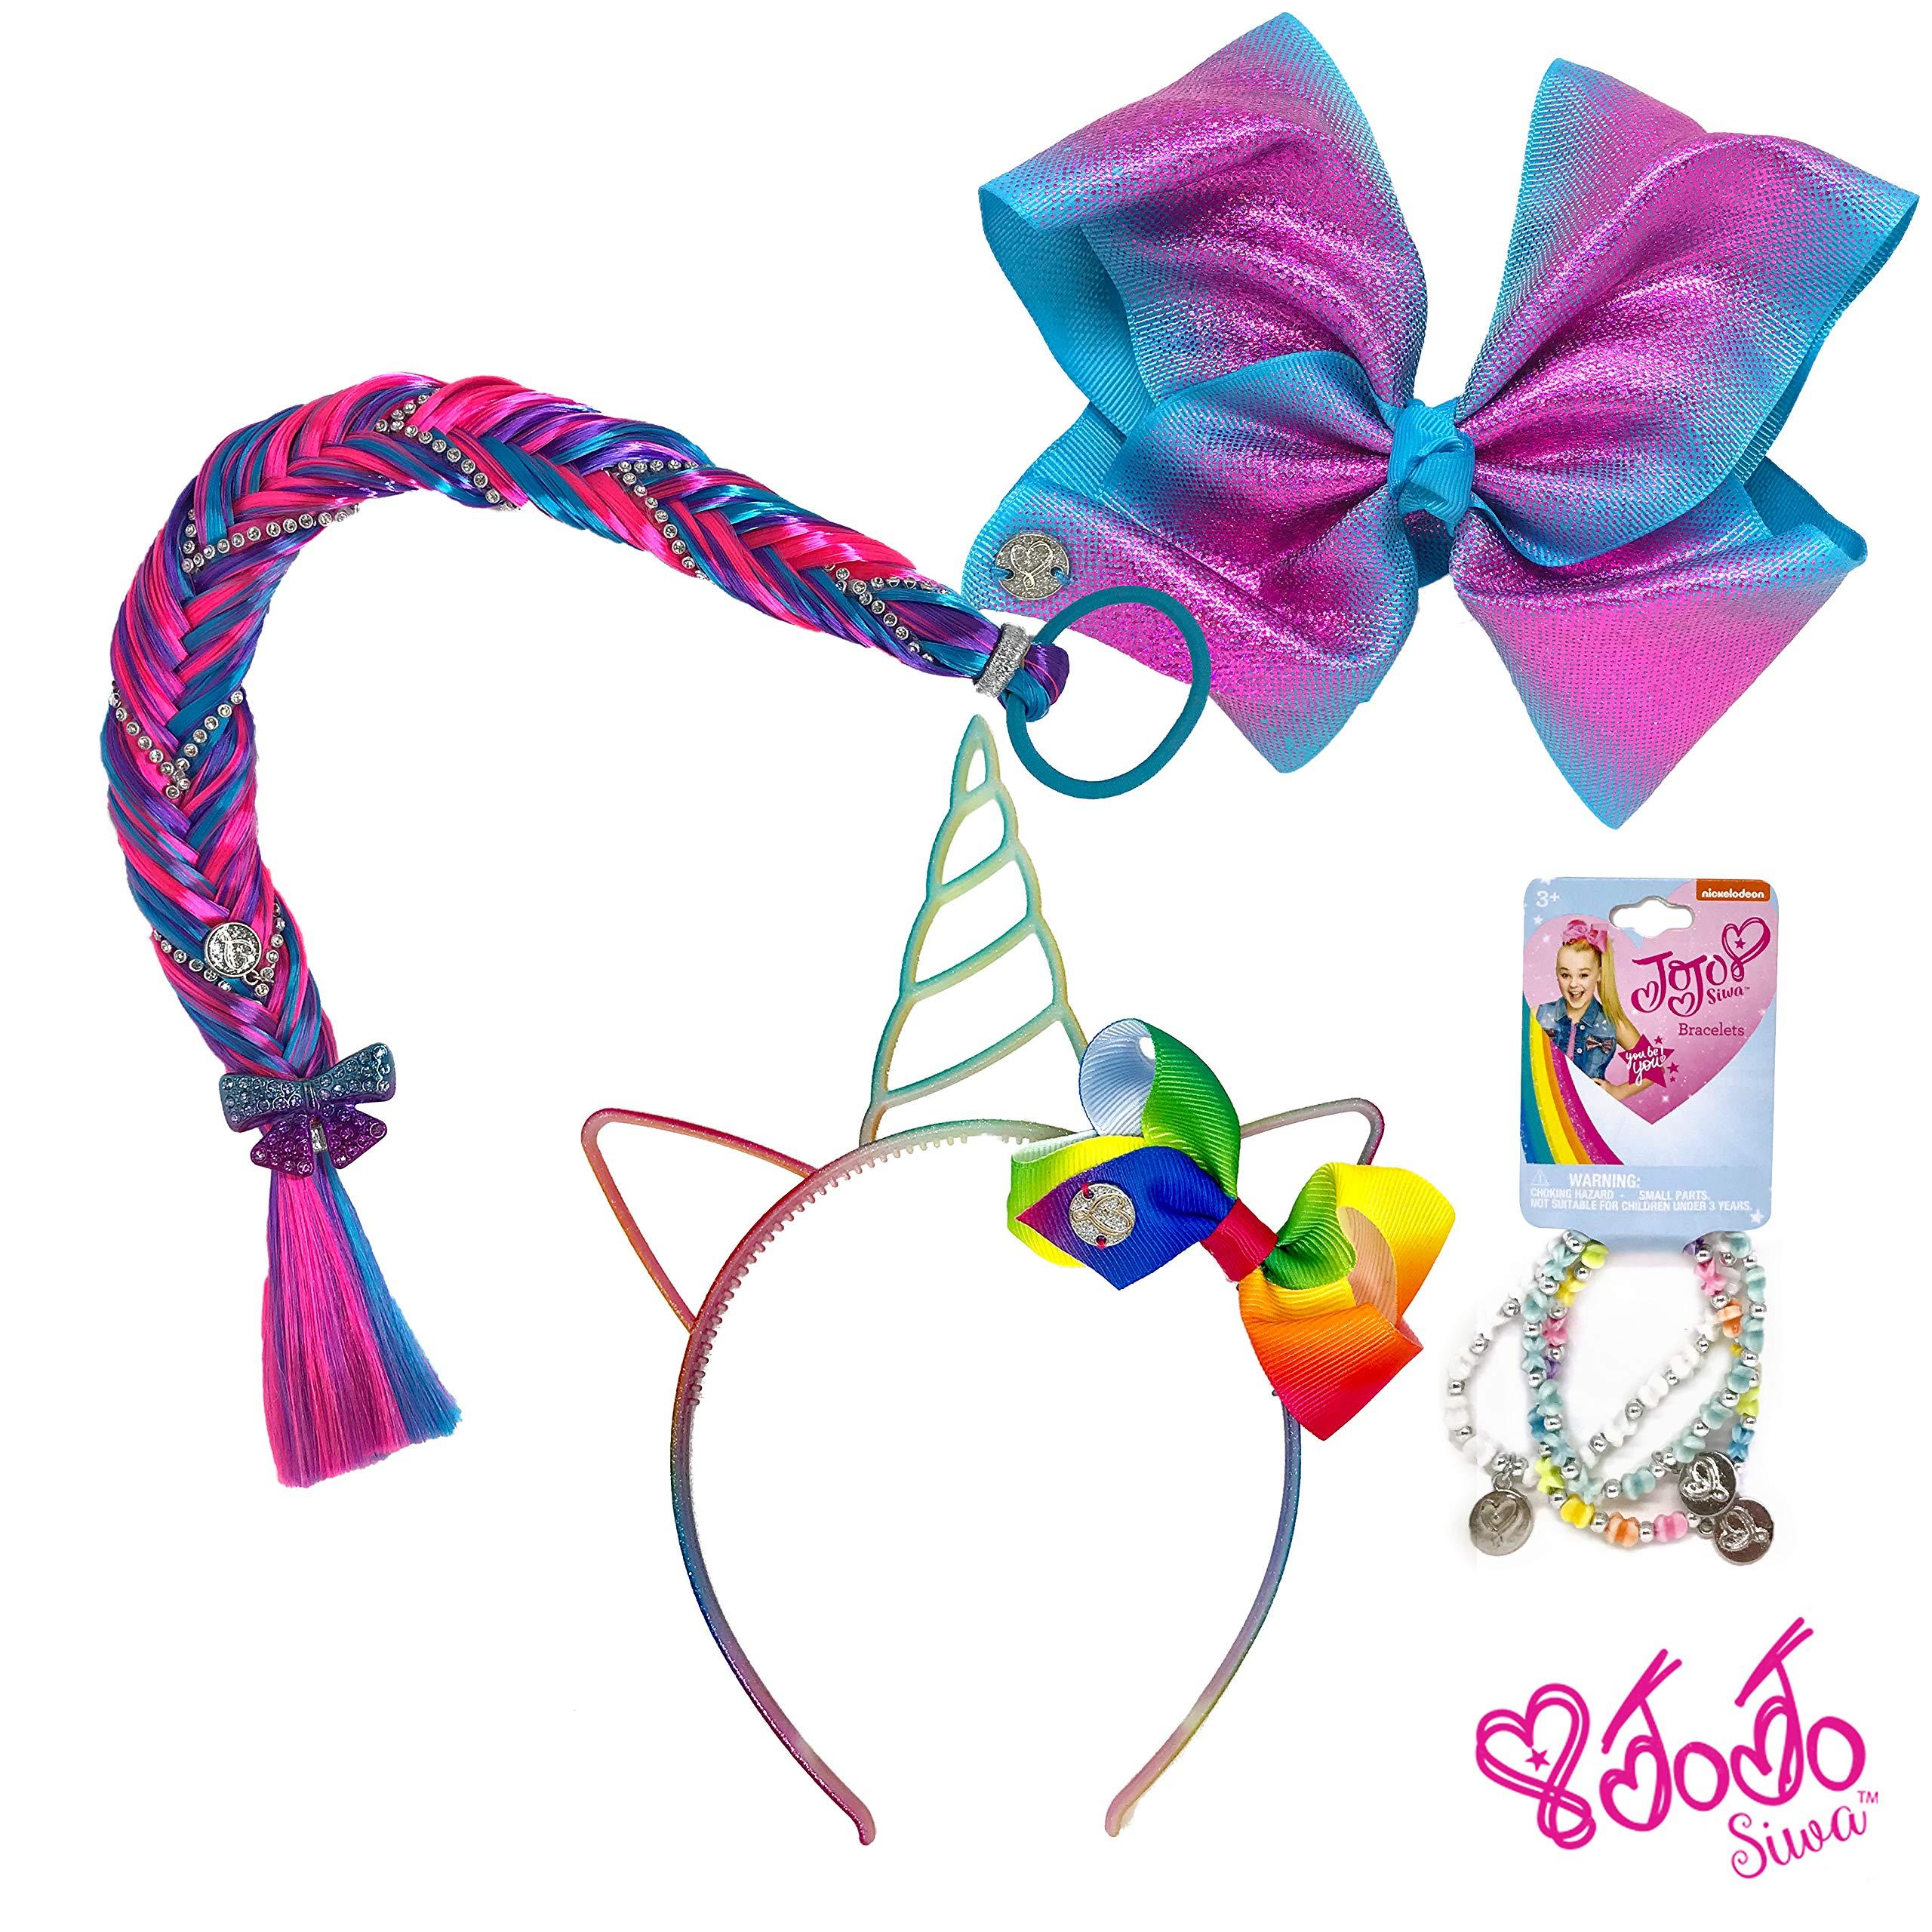 Jojo Siwa Girls Accessory Set, Bow Headband 3 Pack Bracelet and Hair Braid Bows Organizer - Purple Blue Rainbow